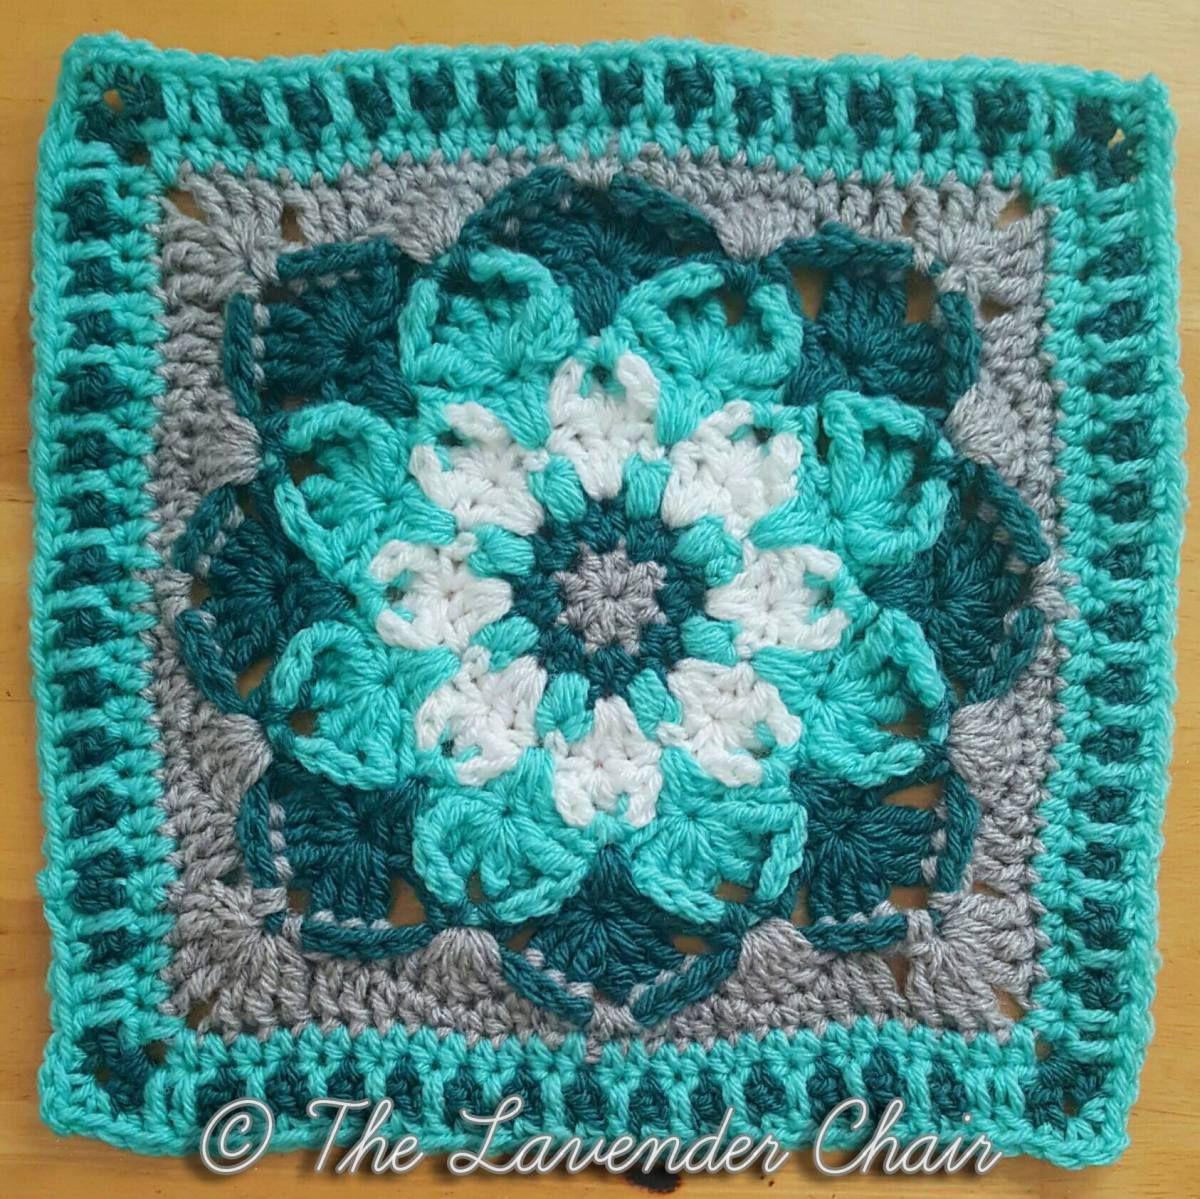 Kaleidoscope lily mandala 12 square free crochet pattern at the kaleidoscope lily mandala 12 square free crochet pattern at the lavender chair mandala bankloansurffo Image collections